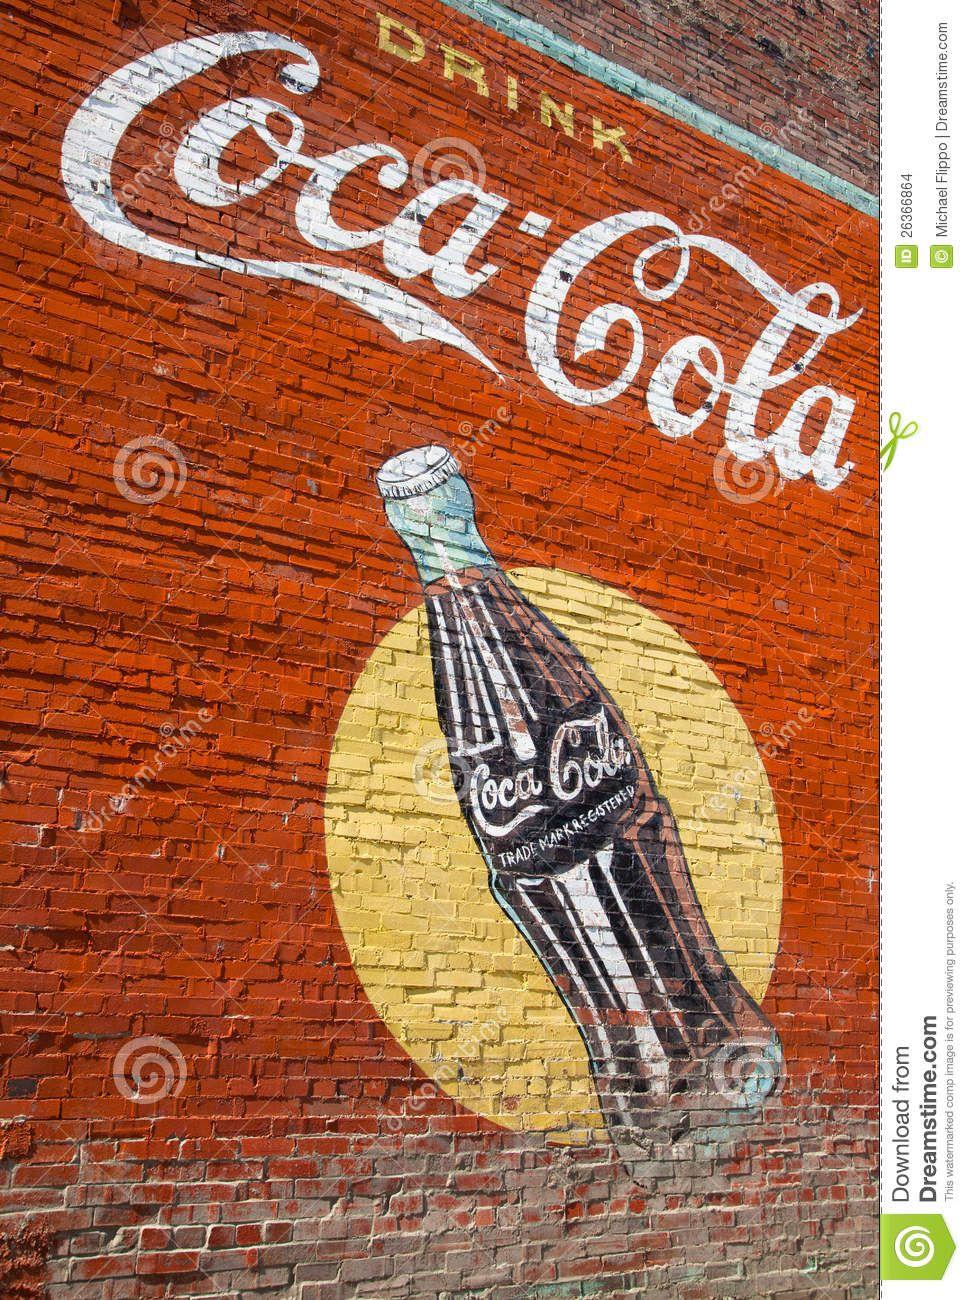 Coca cola wall coke pepsi 7up just soda pop mostly for Coca cola wall mural